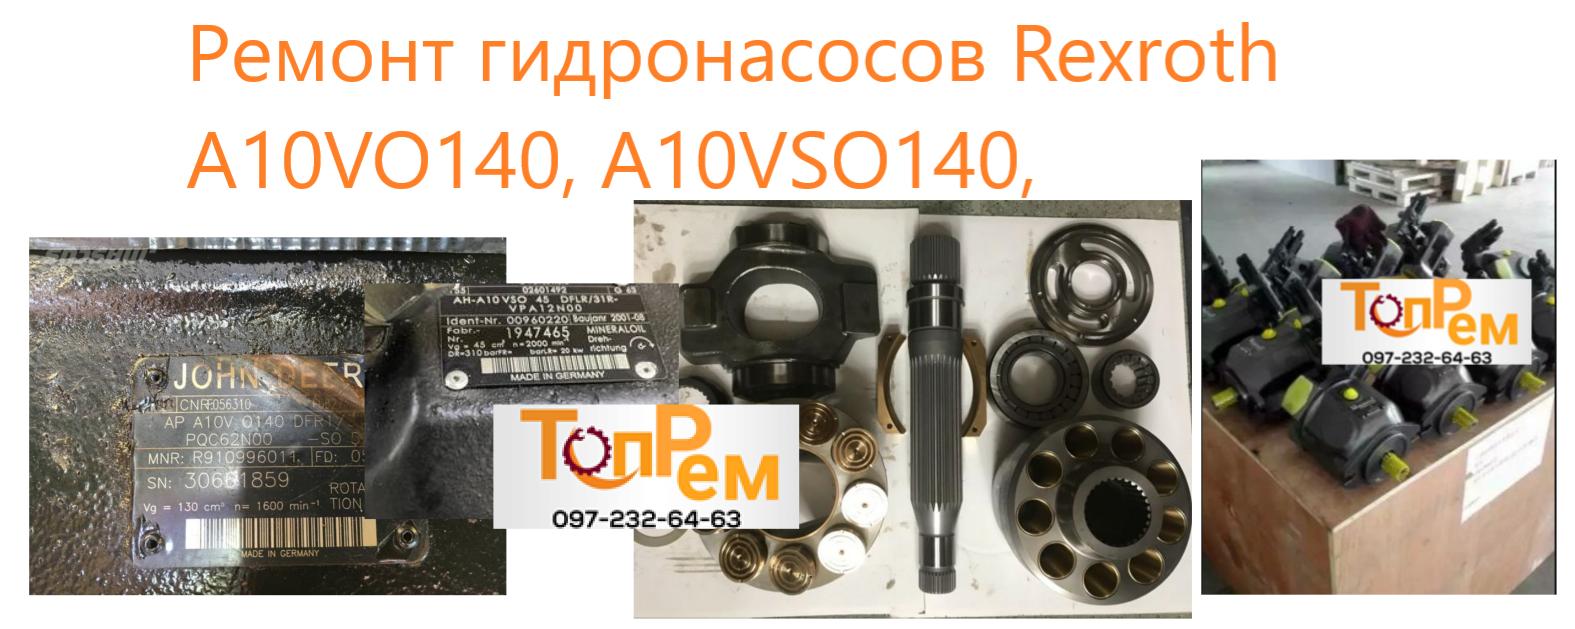 Ремонт гидронасоса Rexroth A10VO140